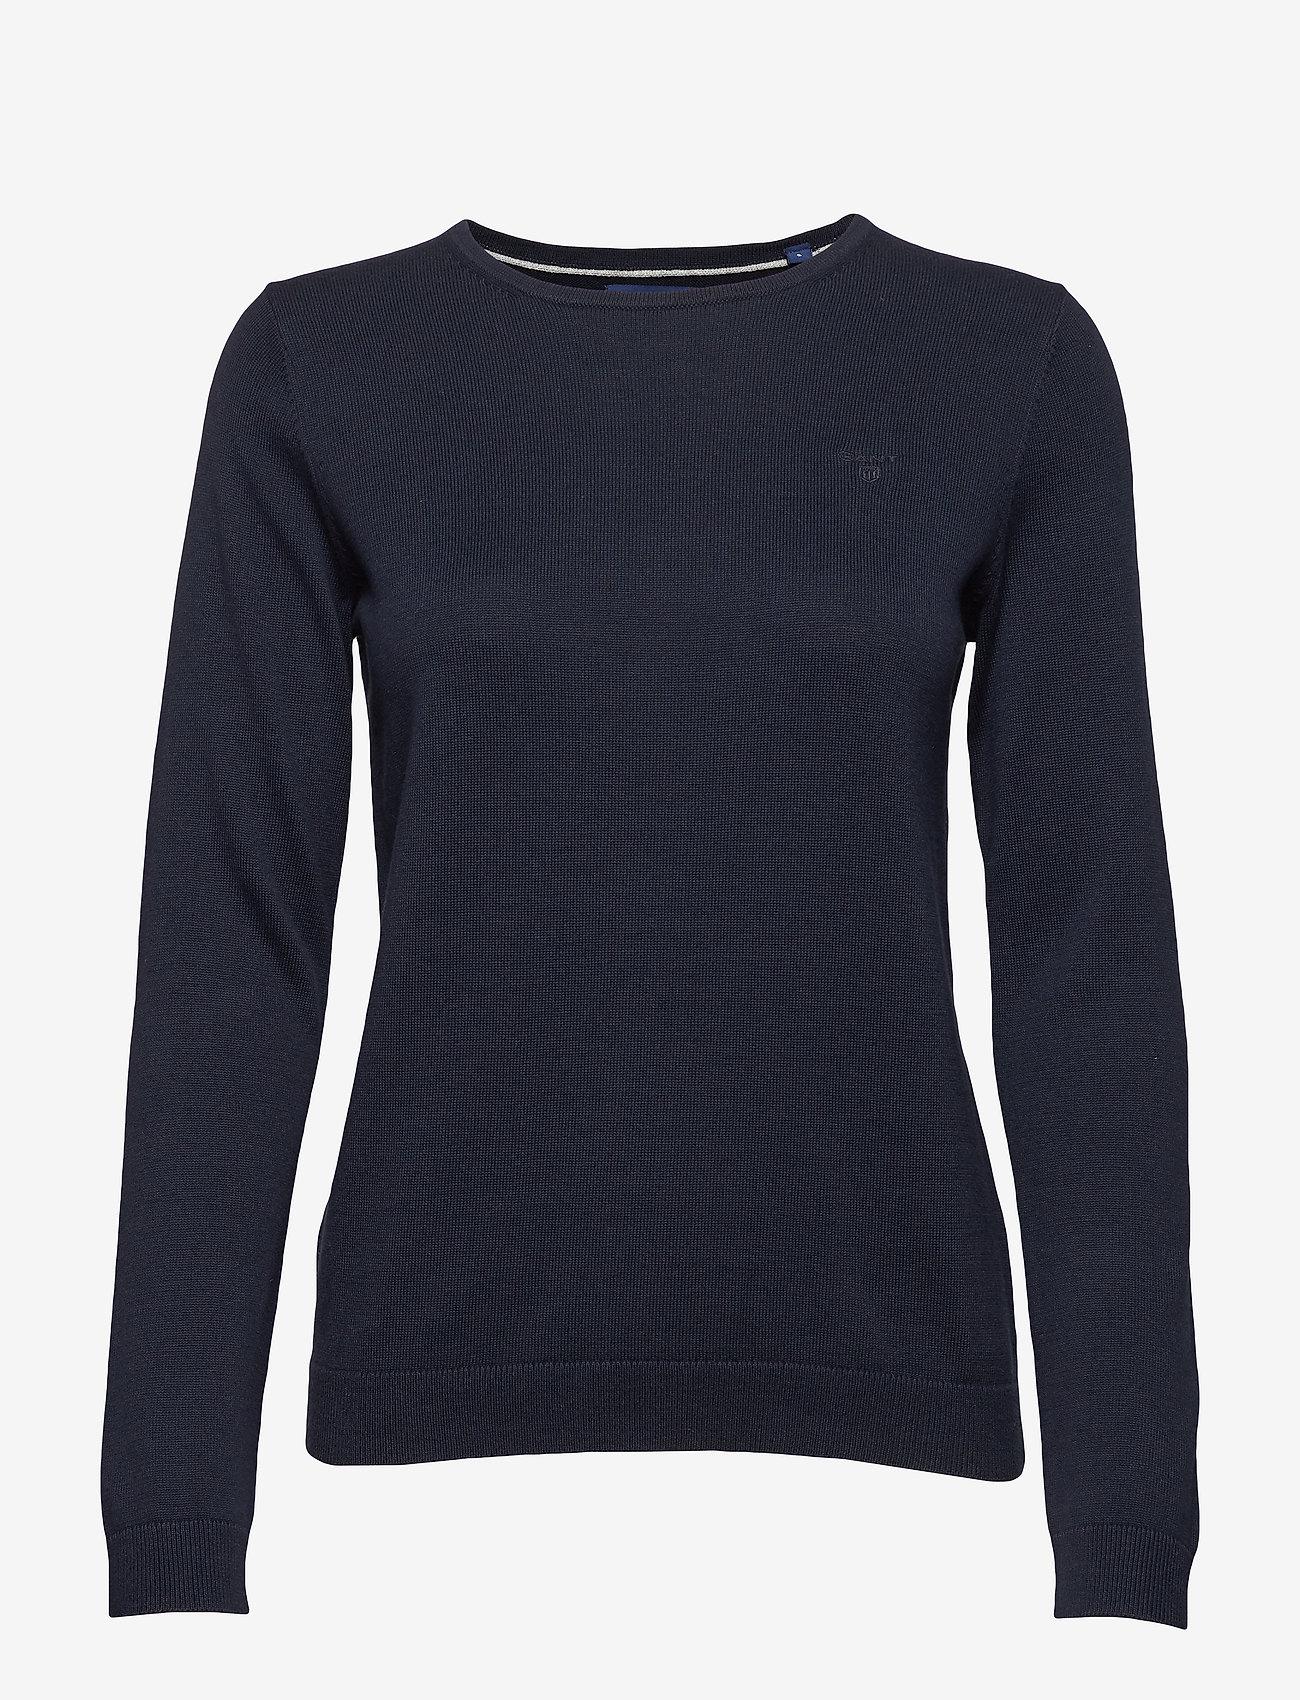 Gant - LT WEIGHT COTTON CREW NECK - neulepuserot - evening blue